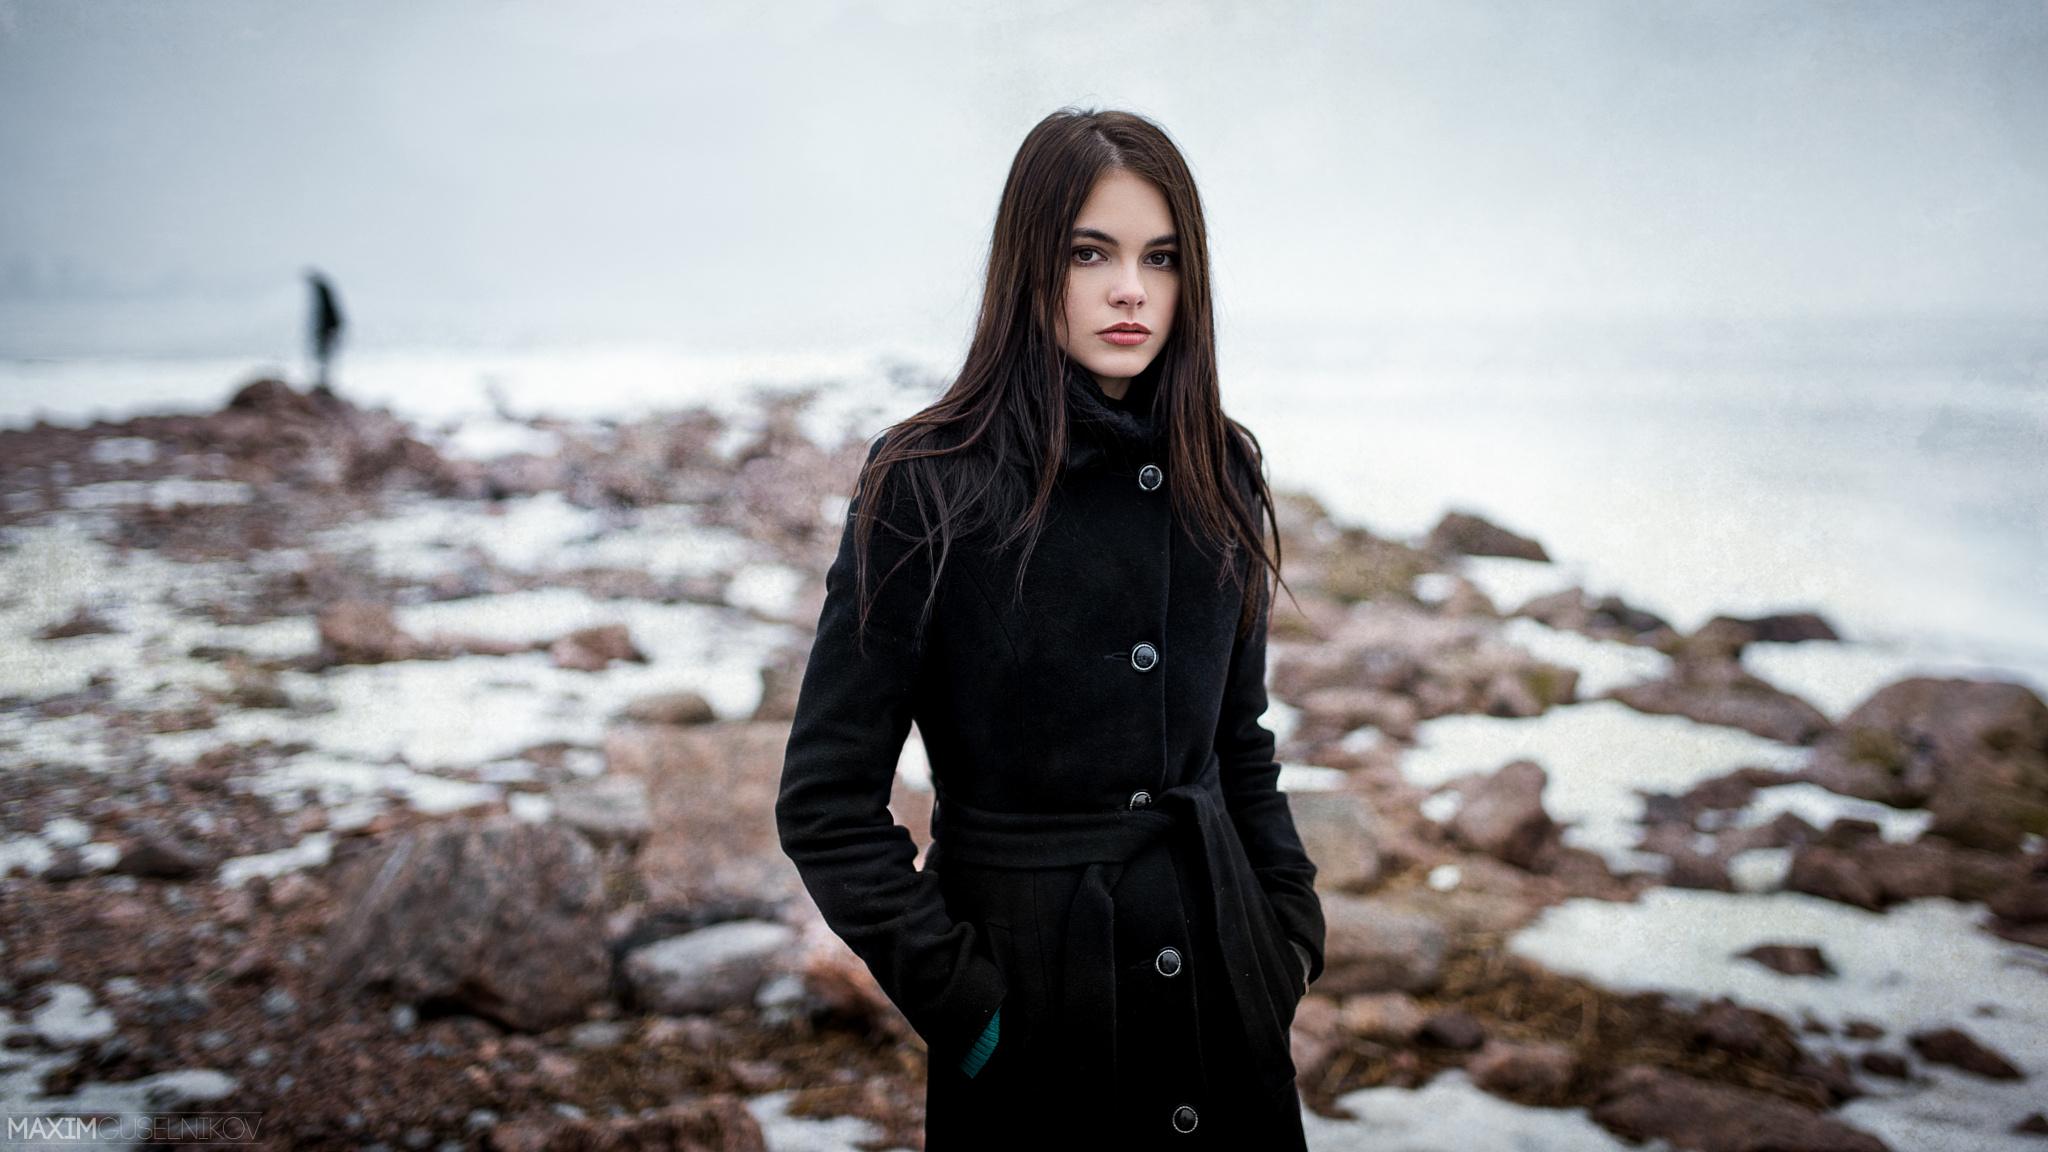 Amazing Oktyabrina Maximova Pictures & Backgrounds